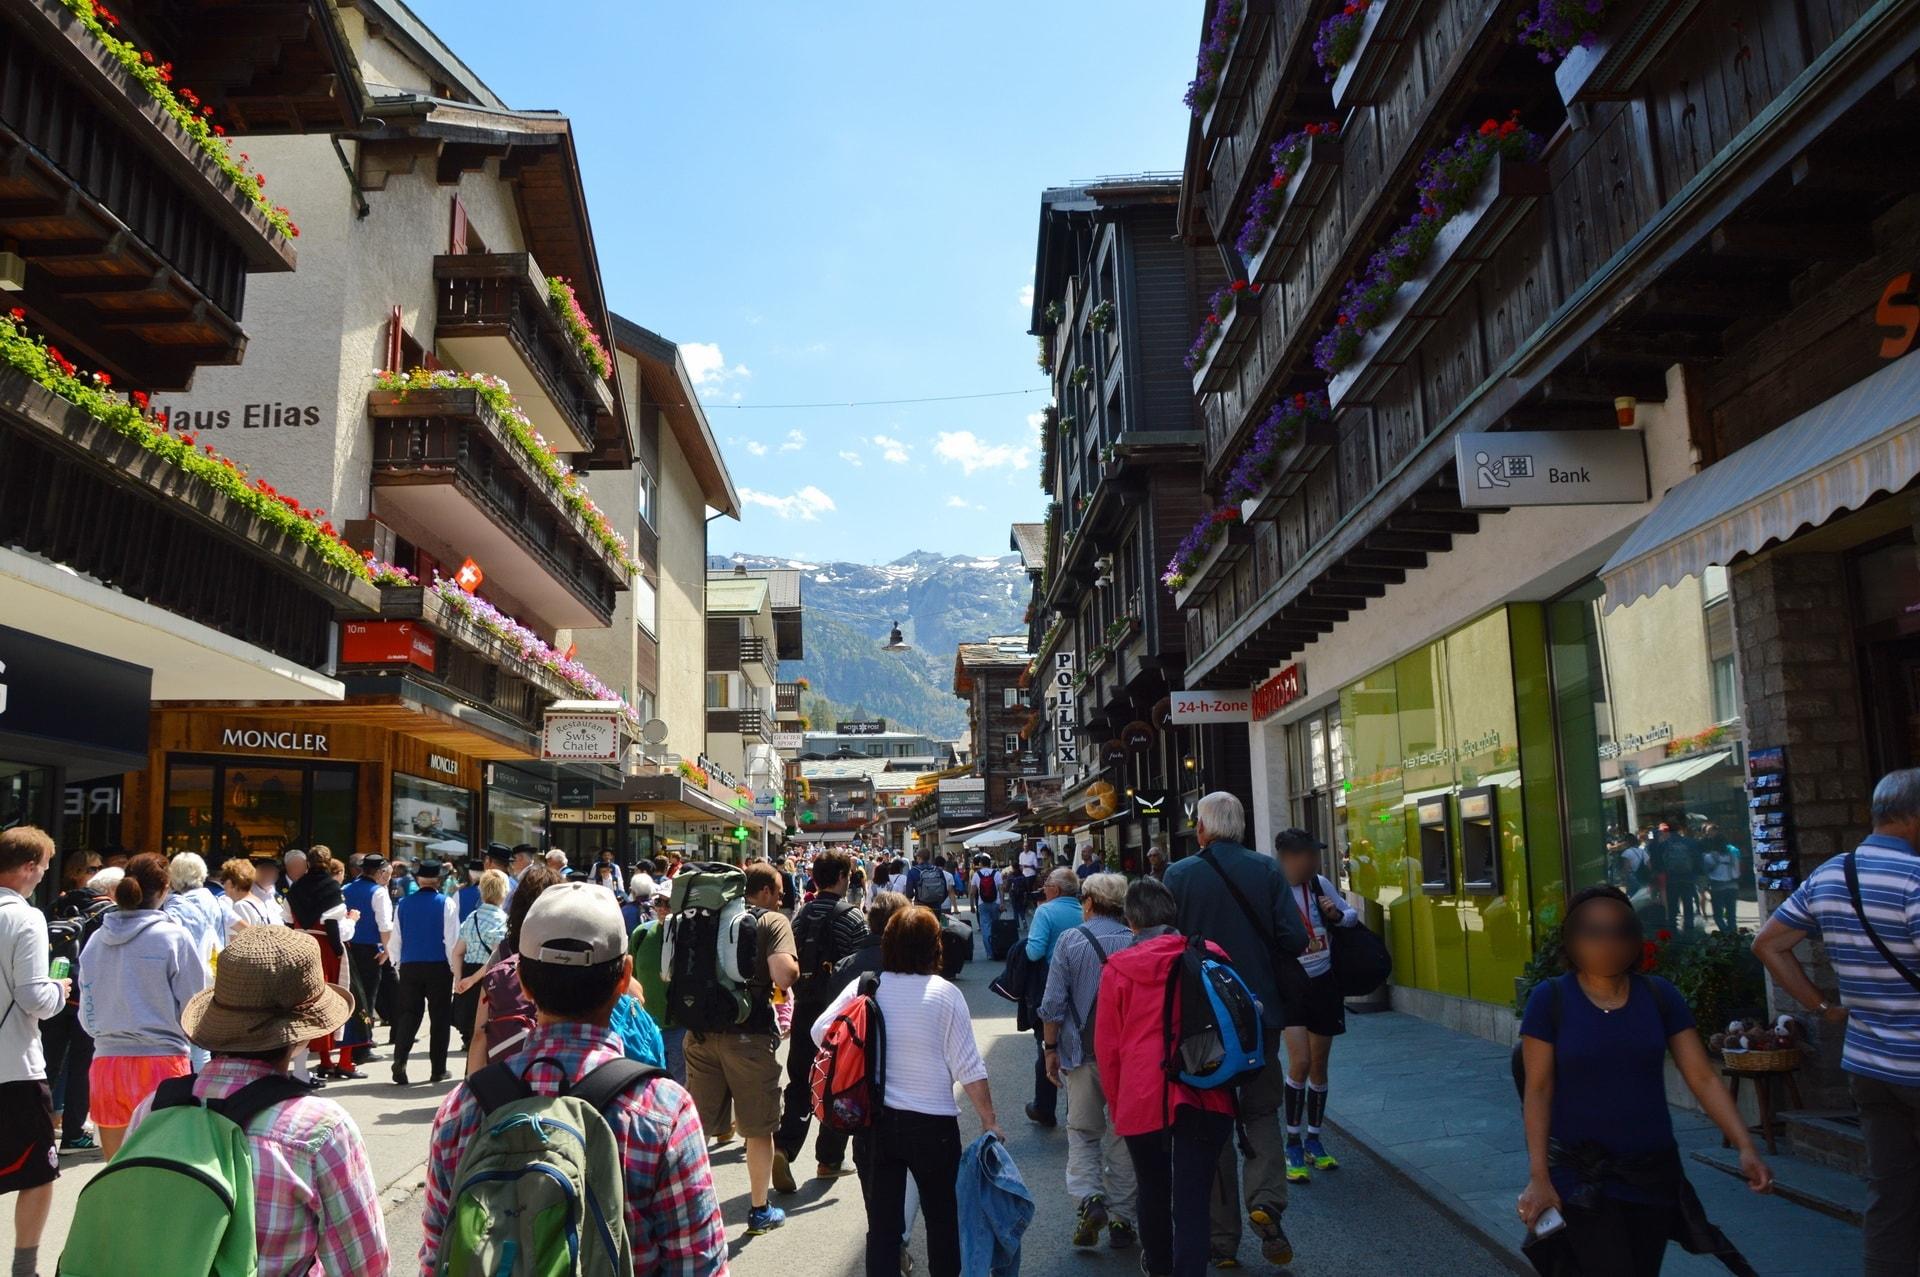 Bahnhofstrasse is Zermatt's main street